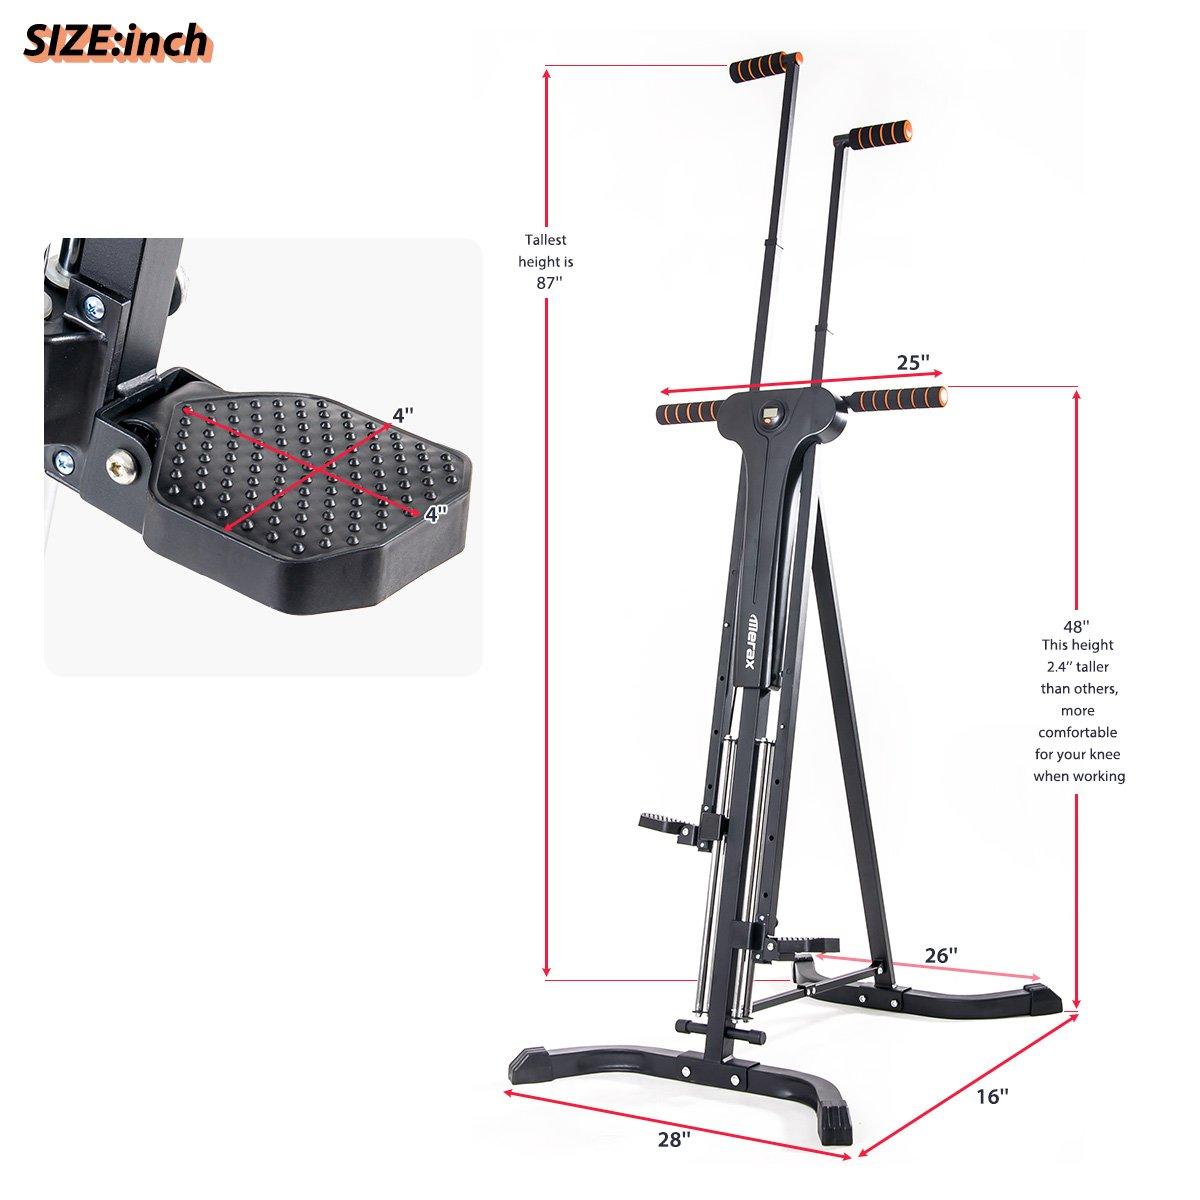 Merax Vertical Climber Fitness Climbing Cardio Machine Full Total Body Workout Fitness Folding Climber 2.0 (Black) by Merax (Image #7)